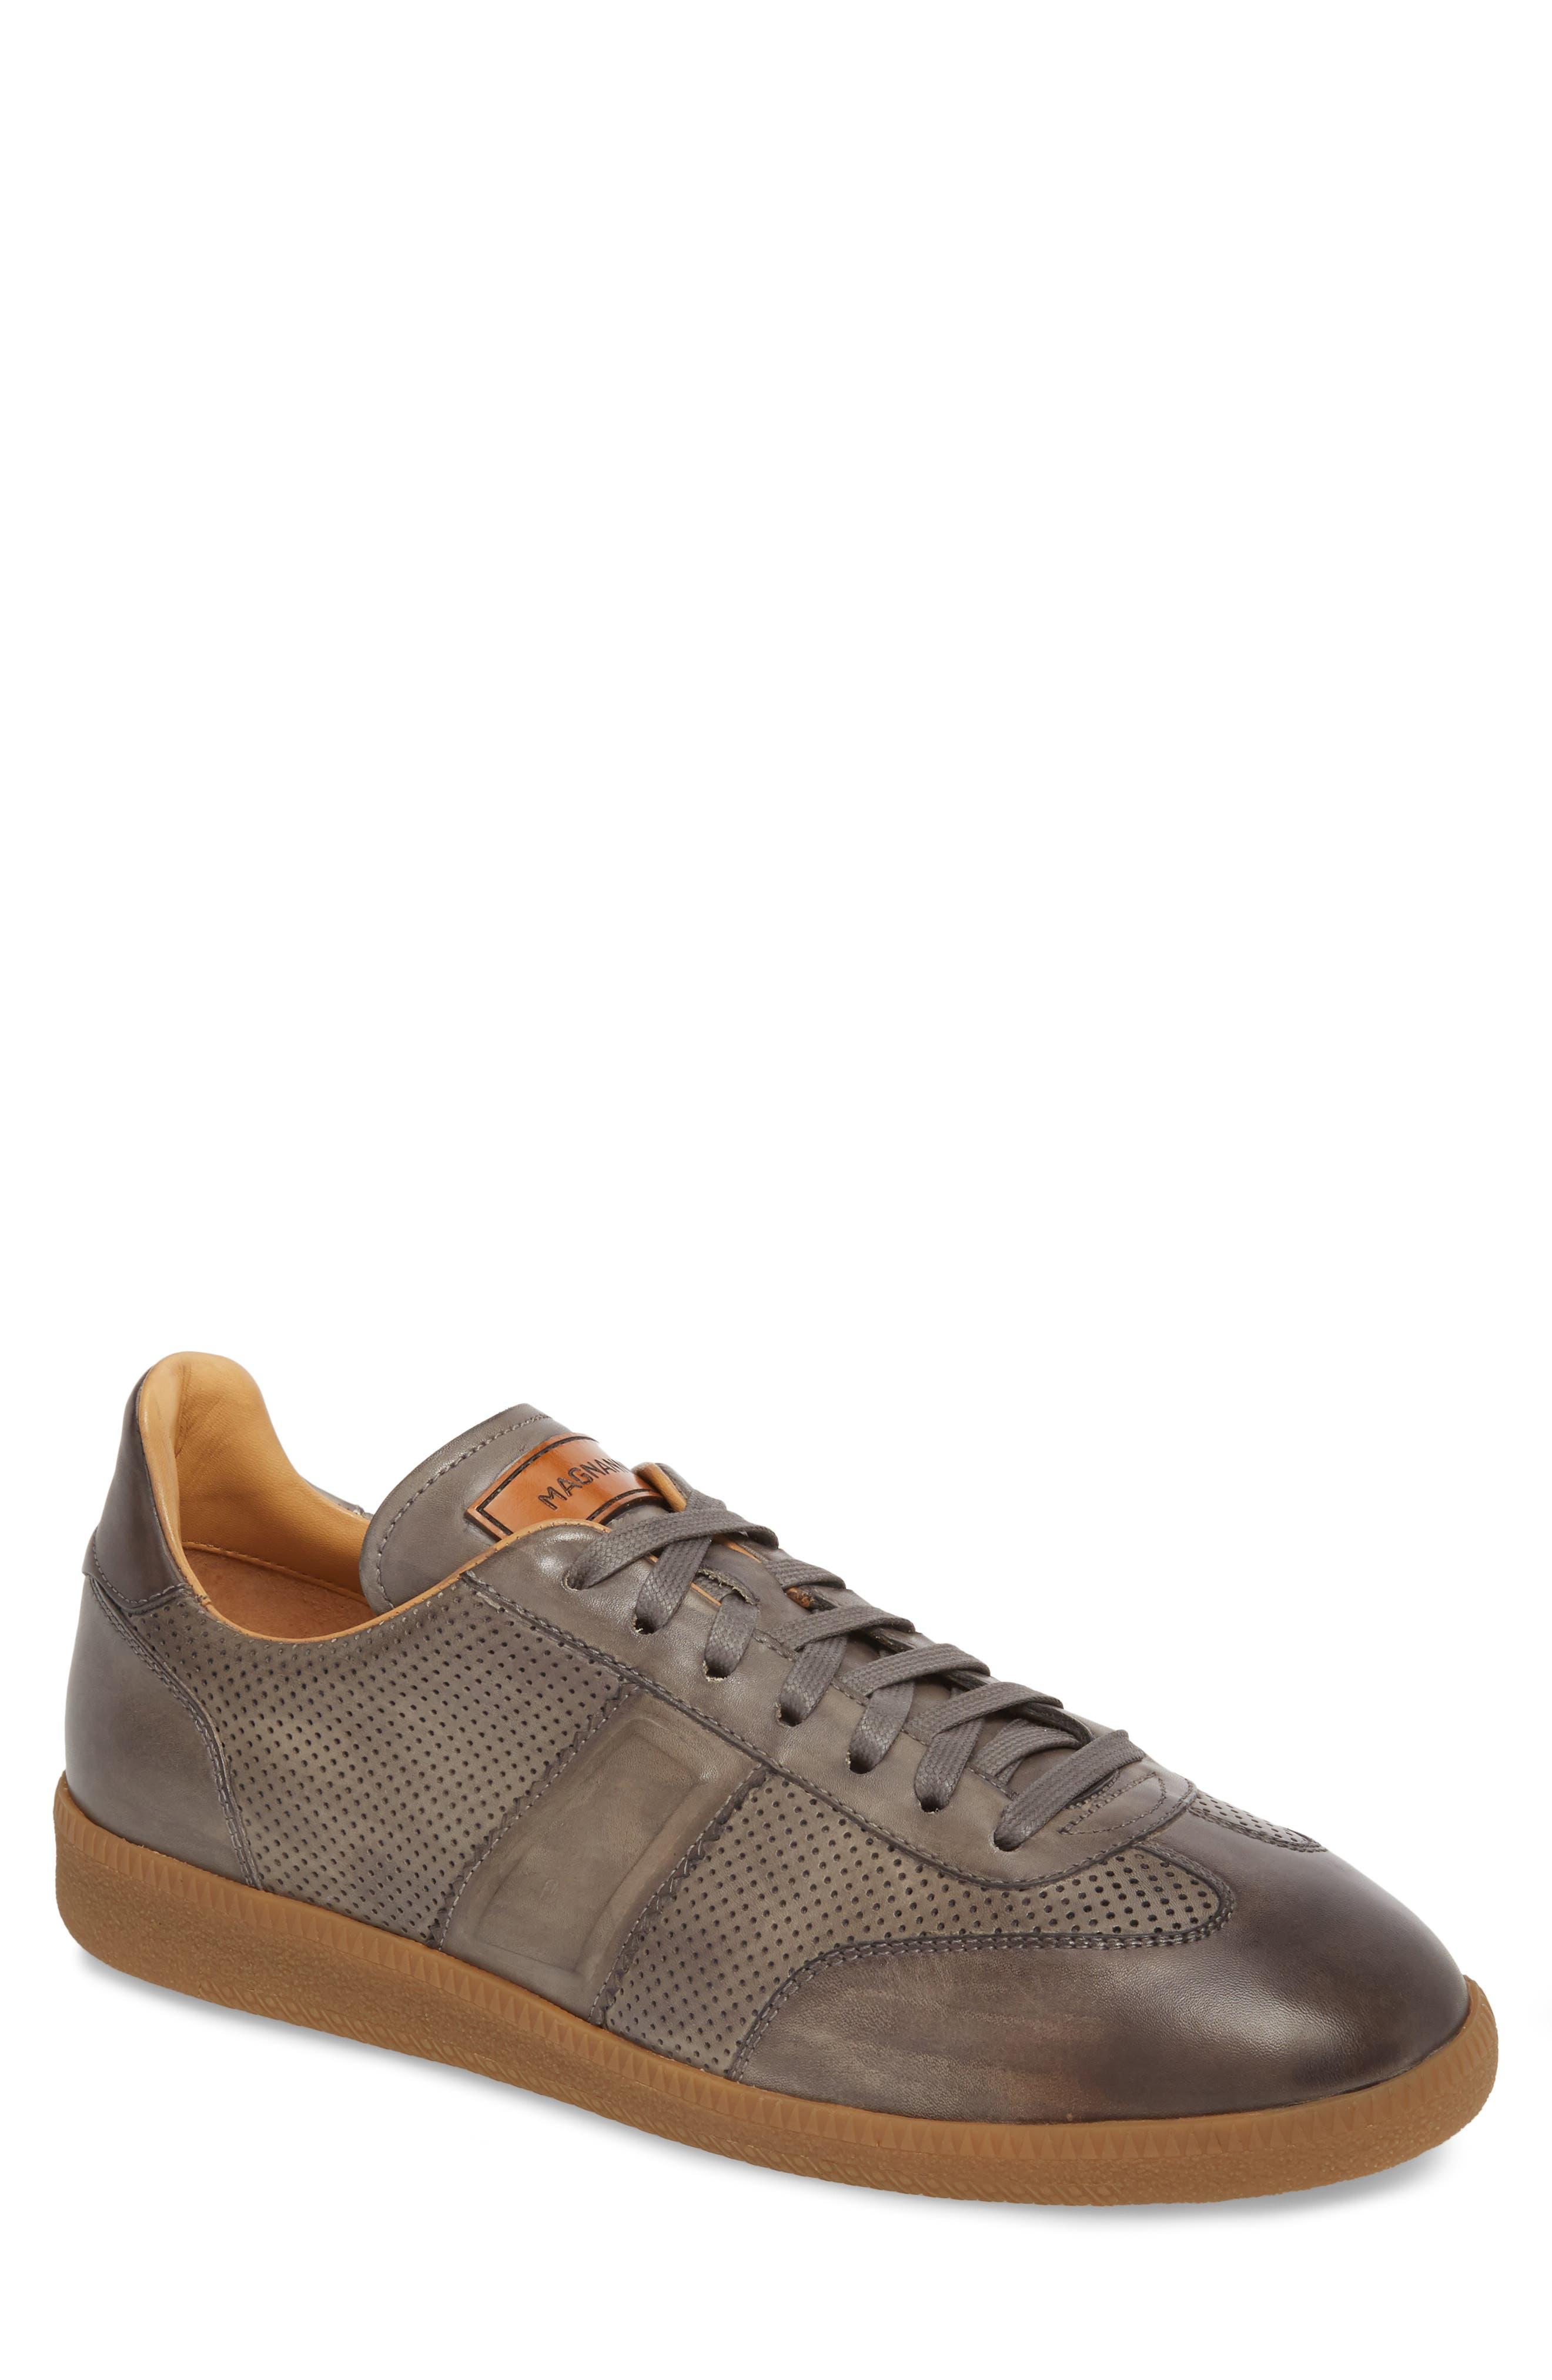 Xavi Embossed Low Top Sneaker,                         Main,                         color, Grey/ Grey Leather